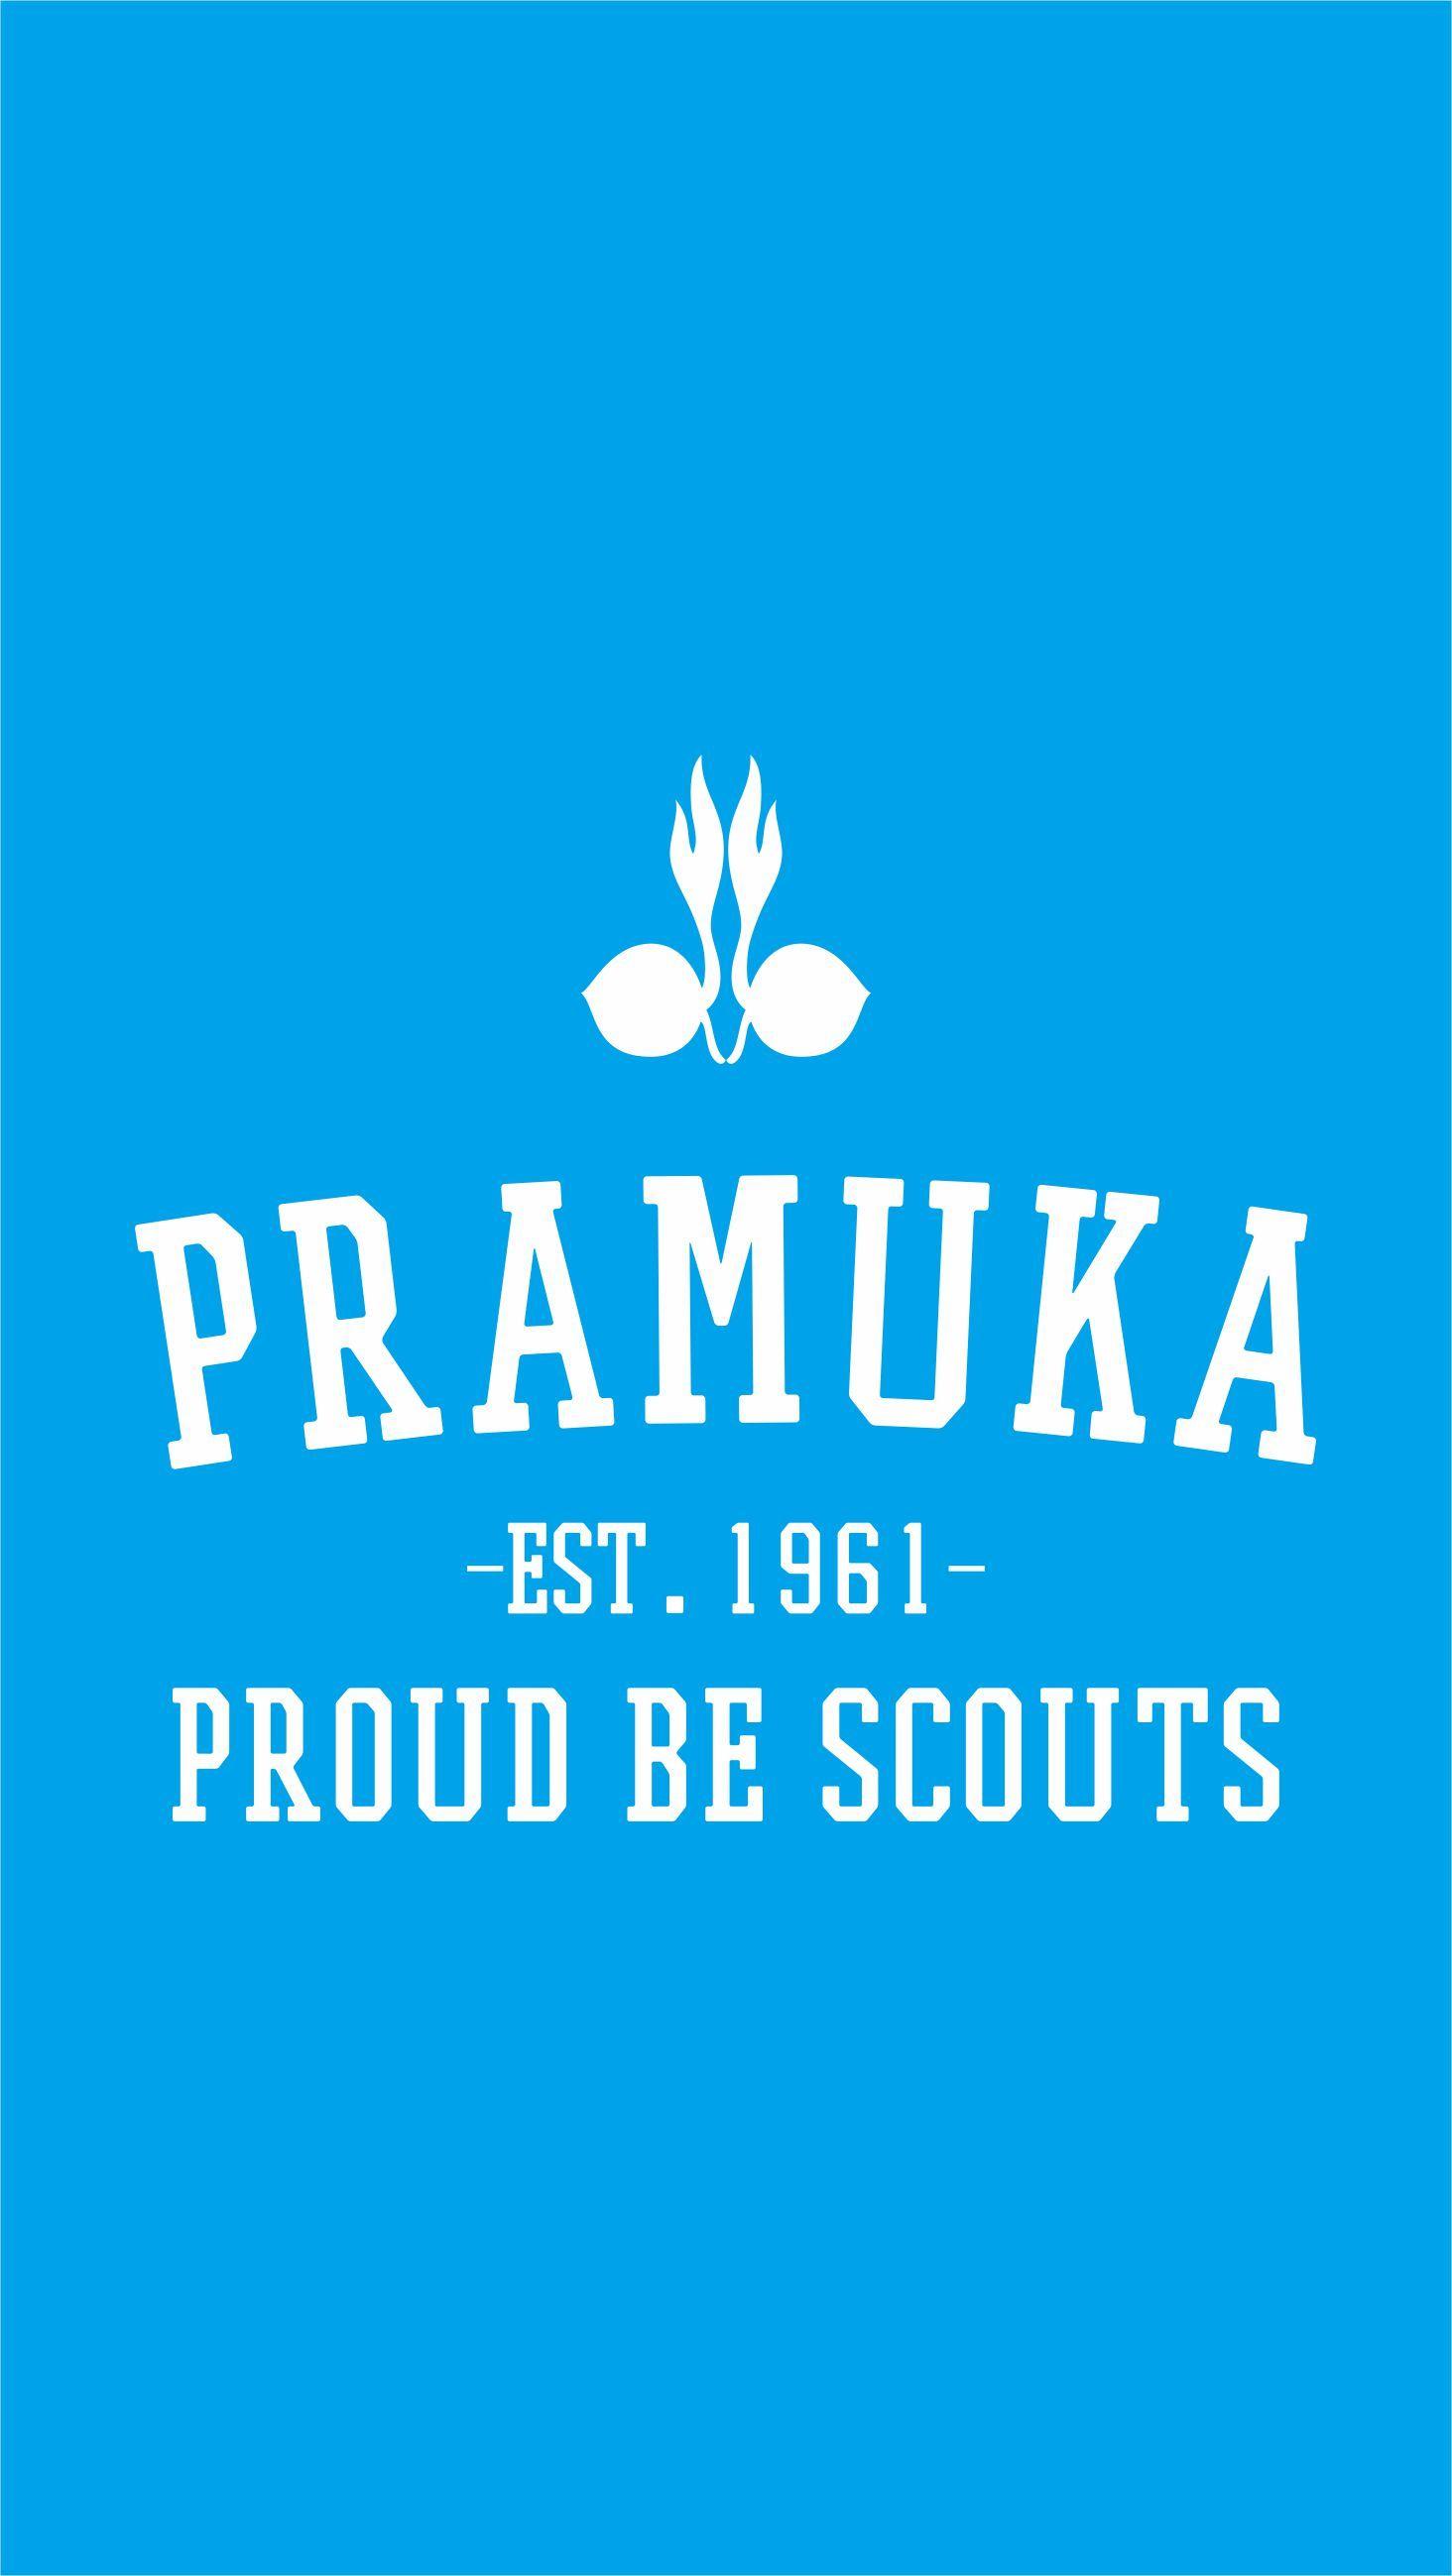 Wallpaper Pramuka Design By Kakmaruf Scout Wallpaper Arrow